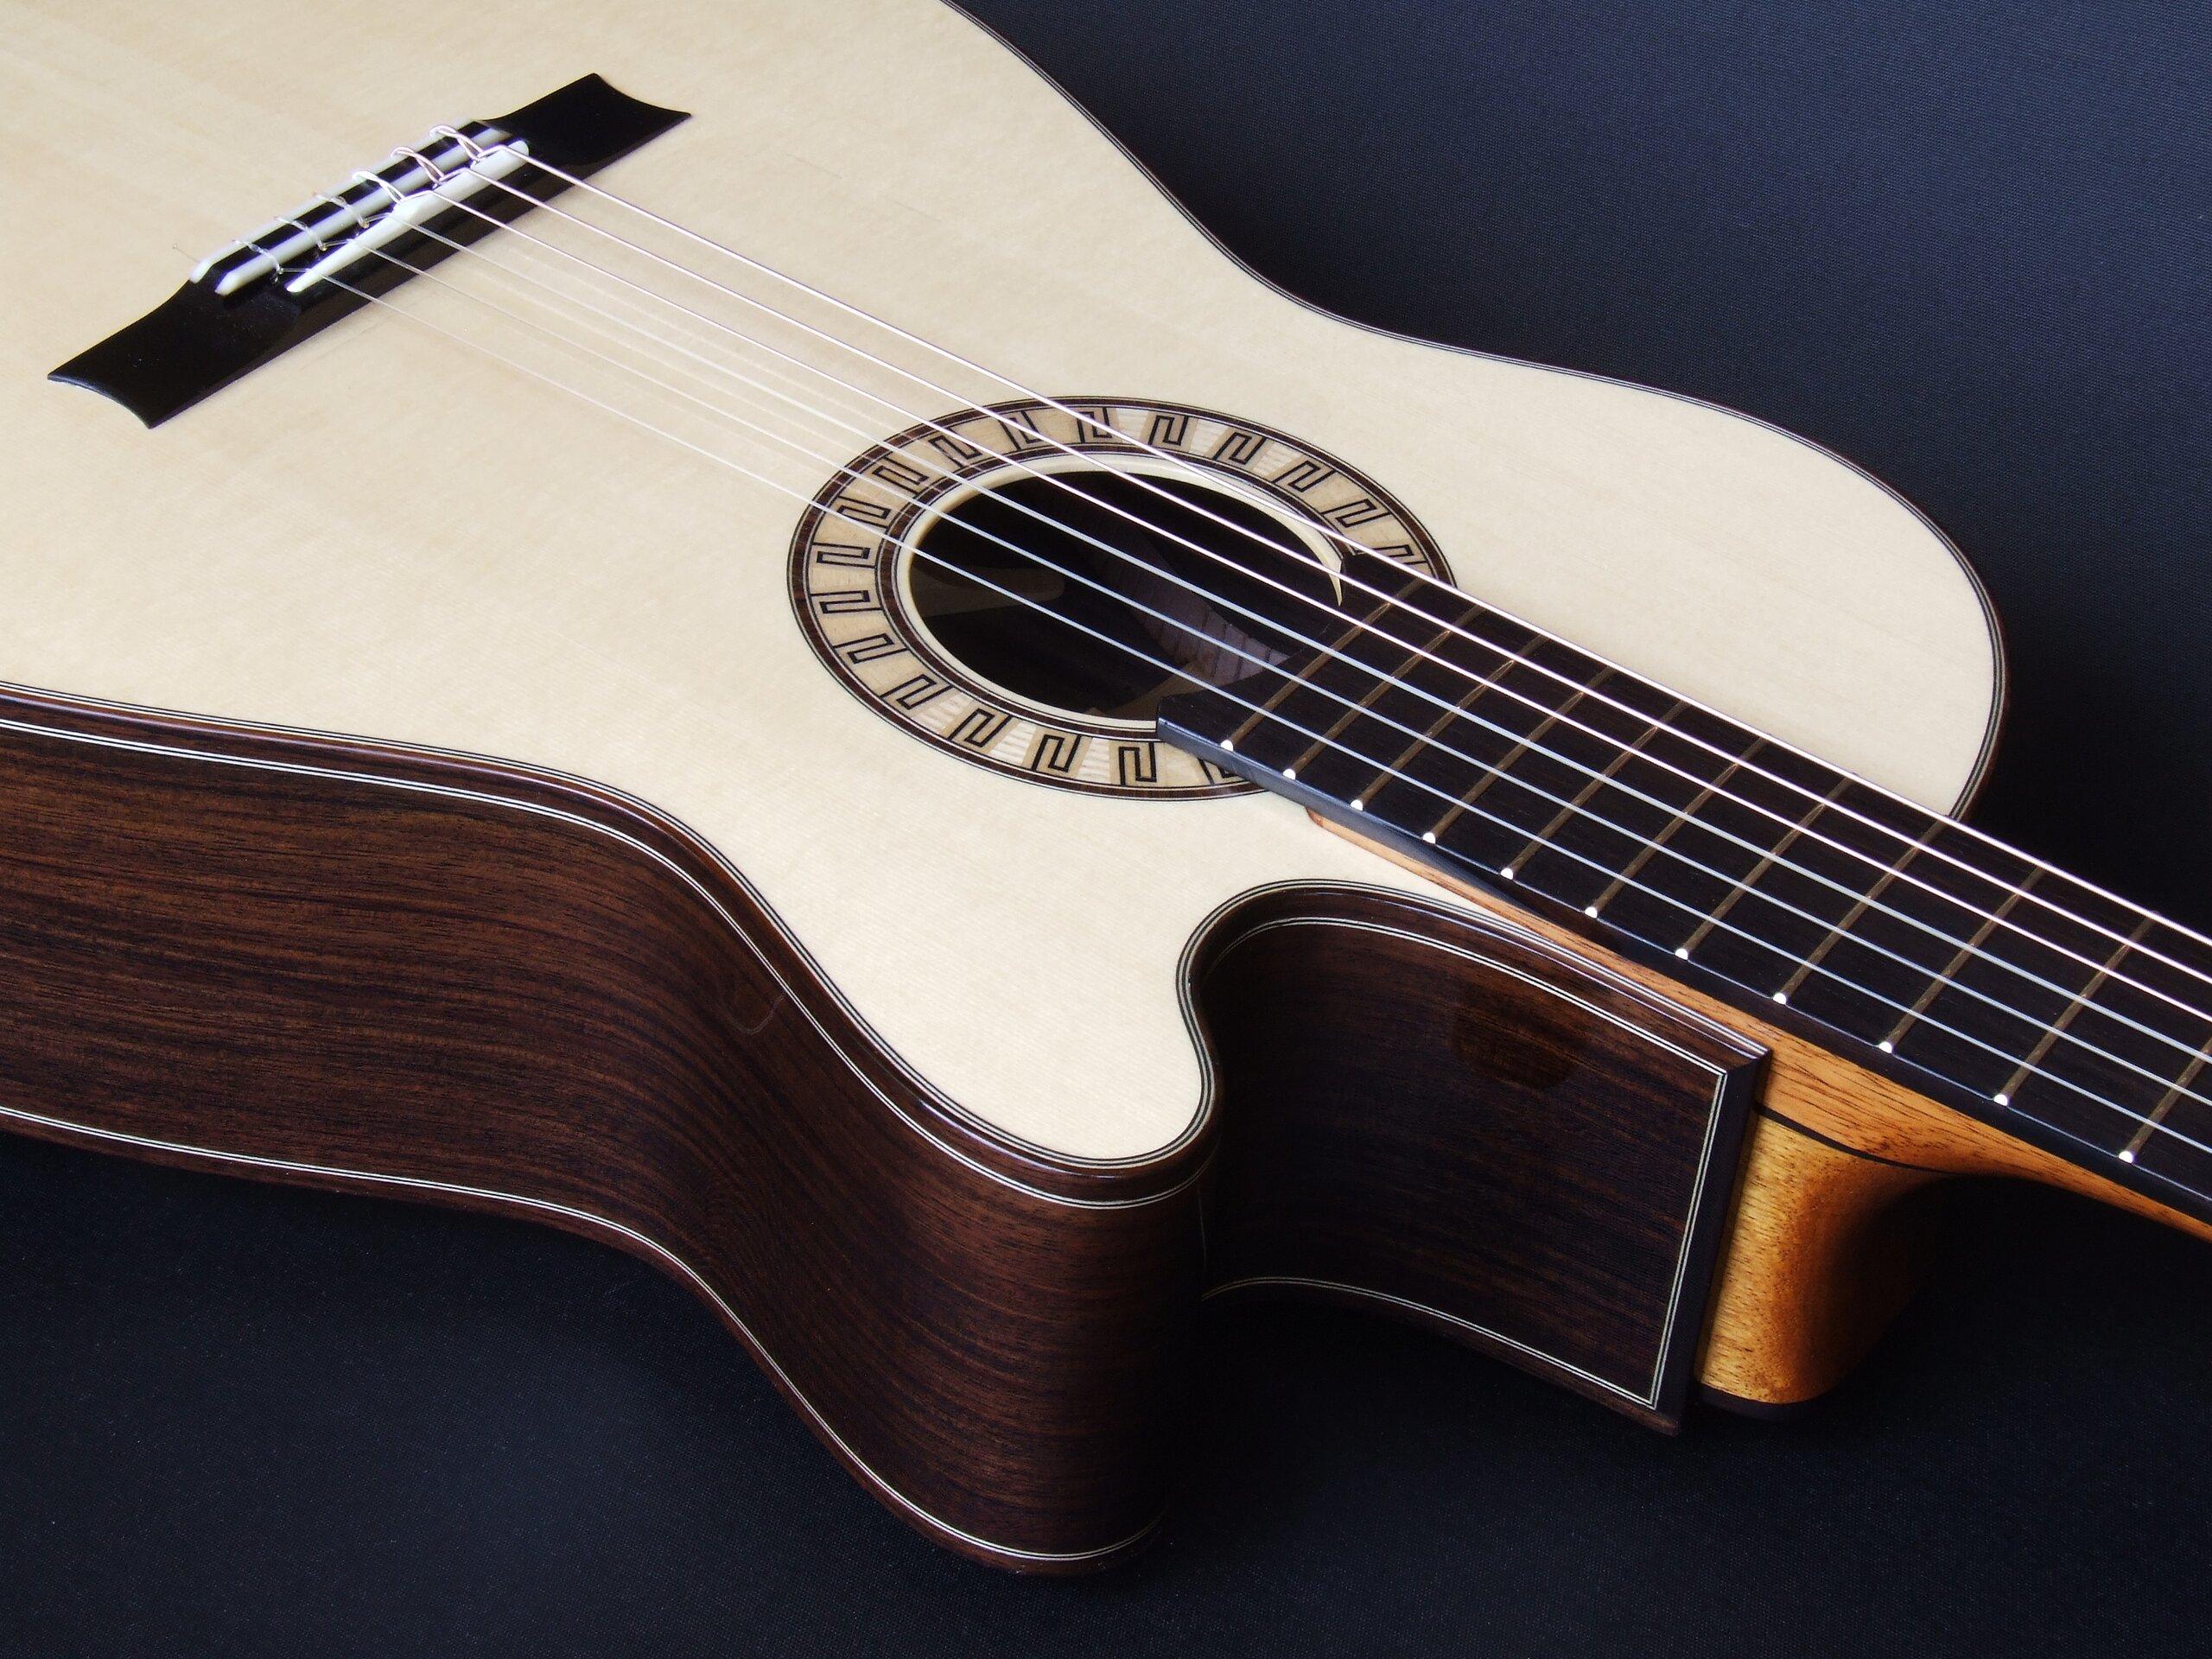 Gore smallbody cutaway tilt-neck classical guitar